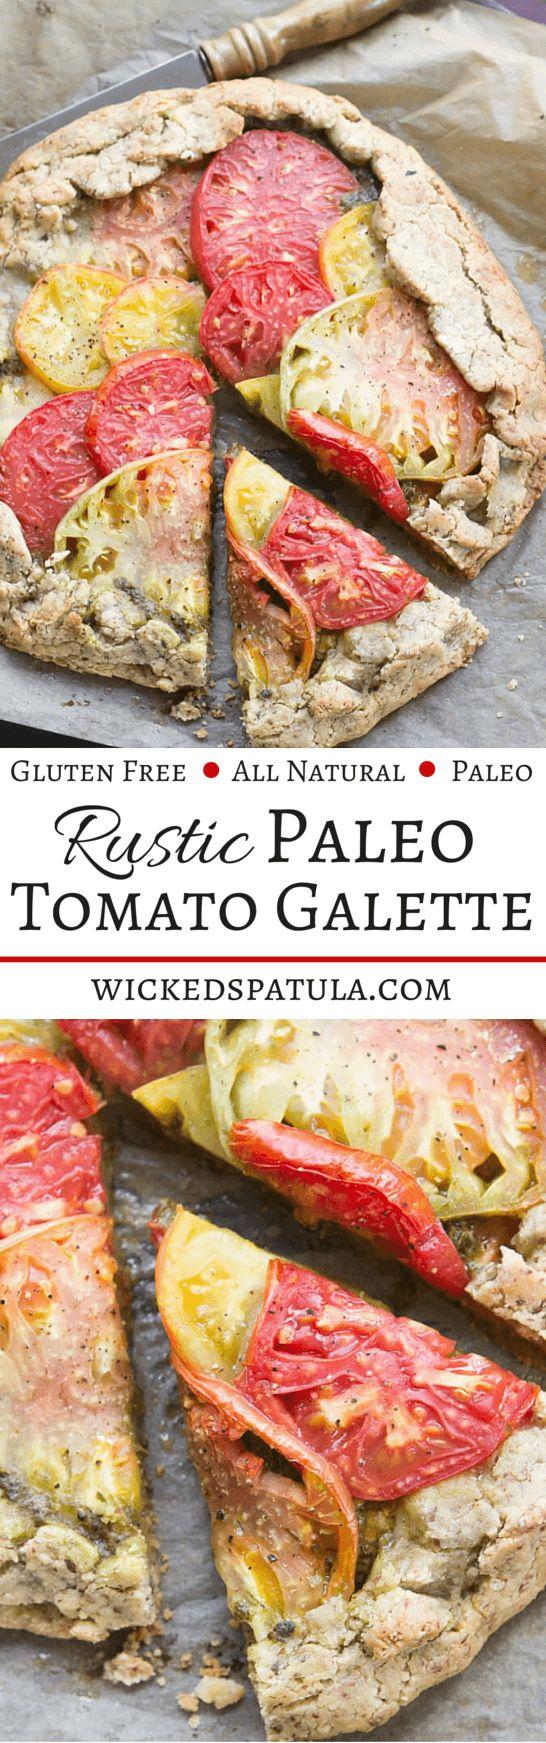 Rustic Paleo Tomato Galette with Arugula Basil Pesto | wickedspatula.com